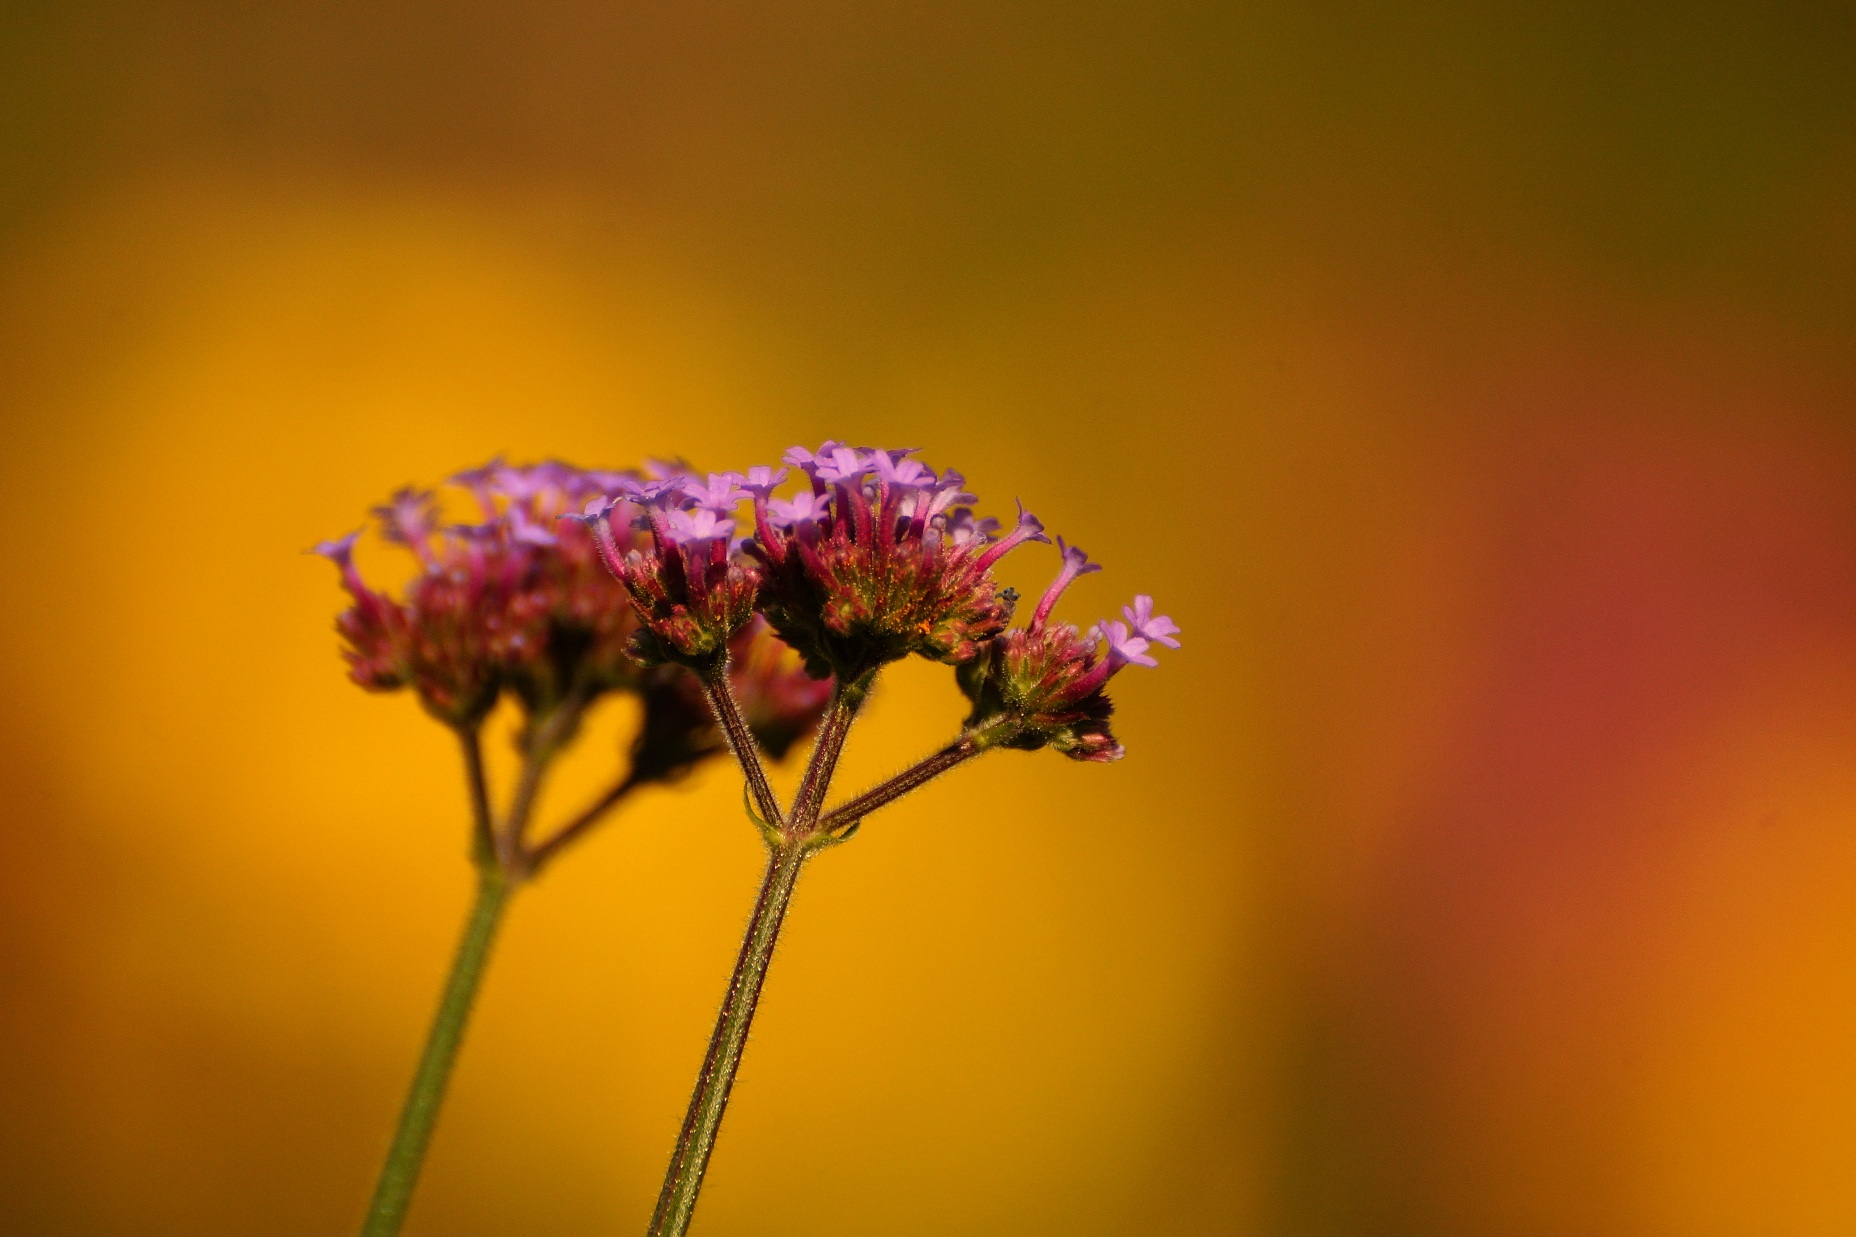 Verbena bonariensis – werbena patagońska, werbena argentyńska